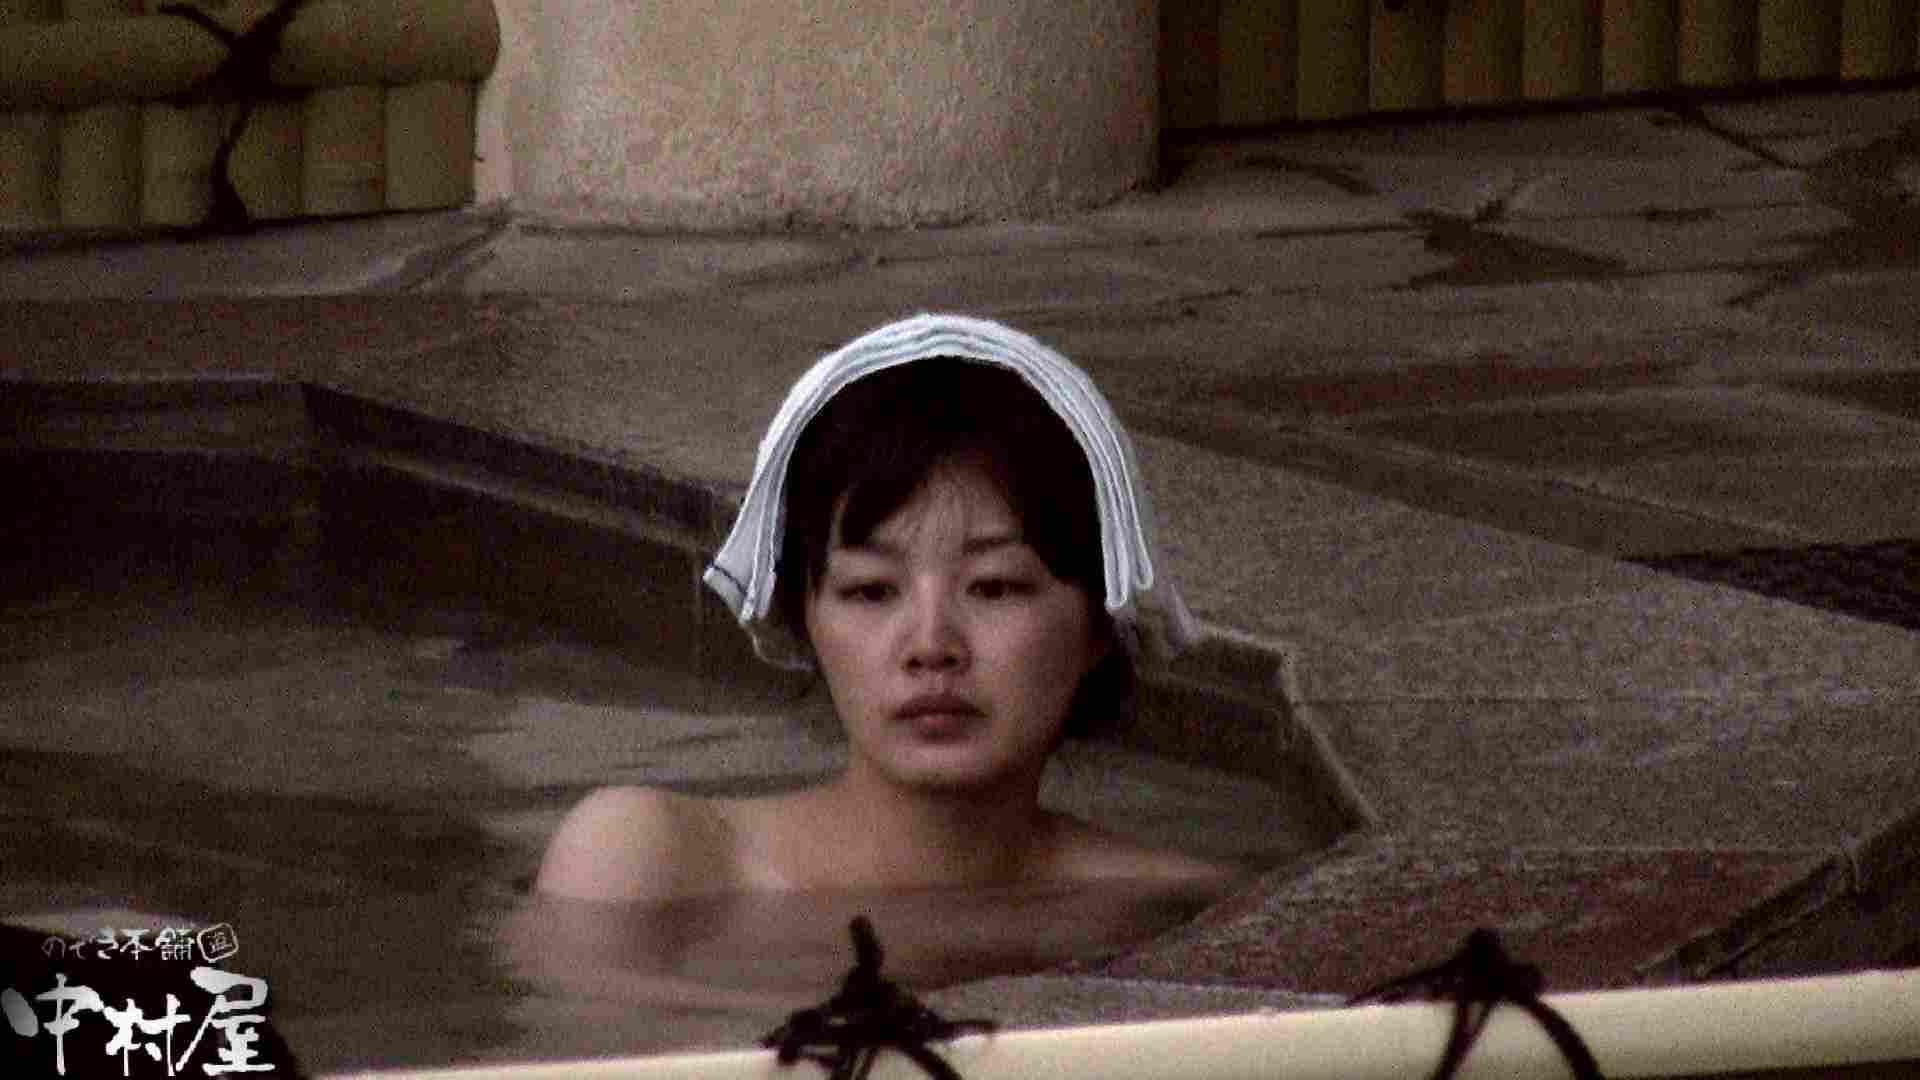 Aquaな露天風呂Vol.916 盗撮映像  73Pix 37